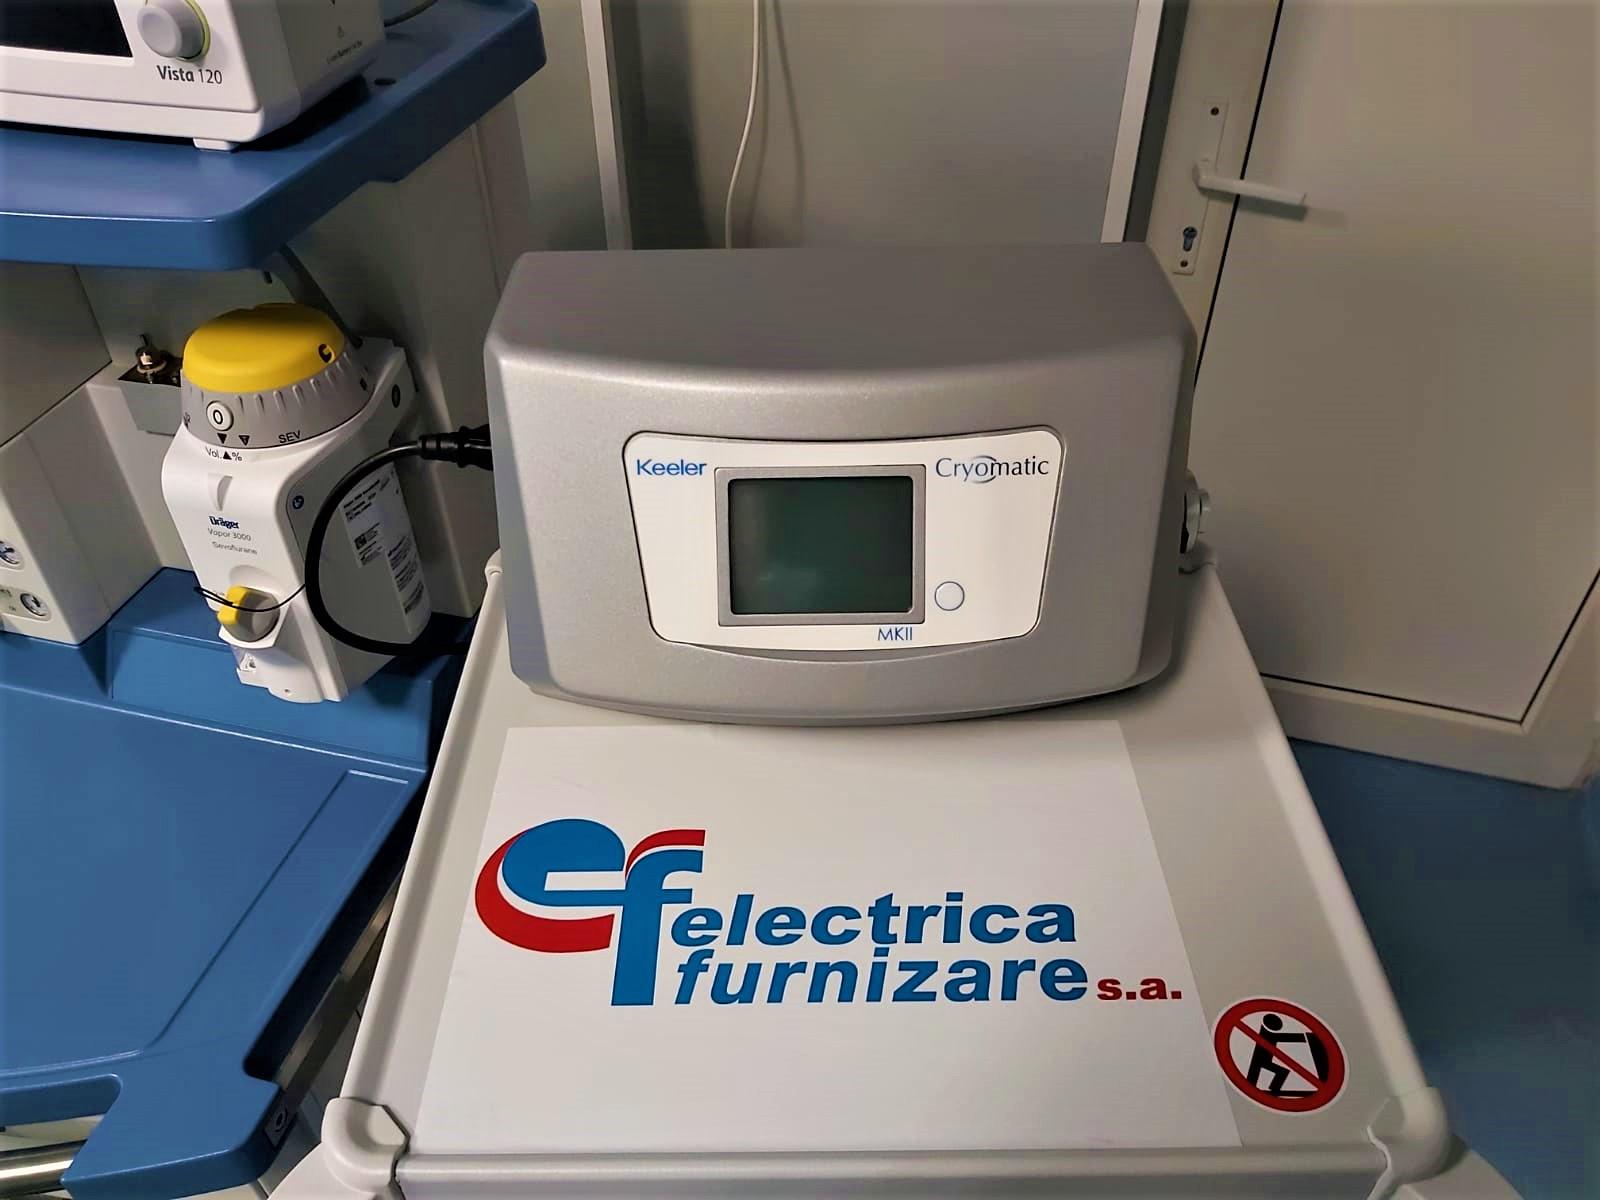 electrica furnizare foto1